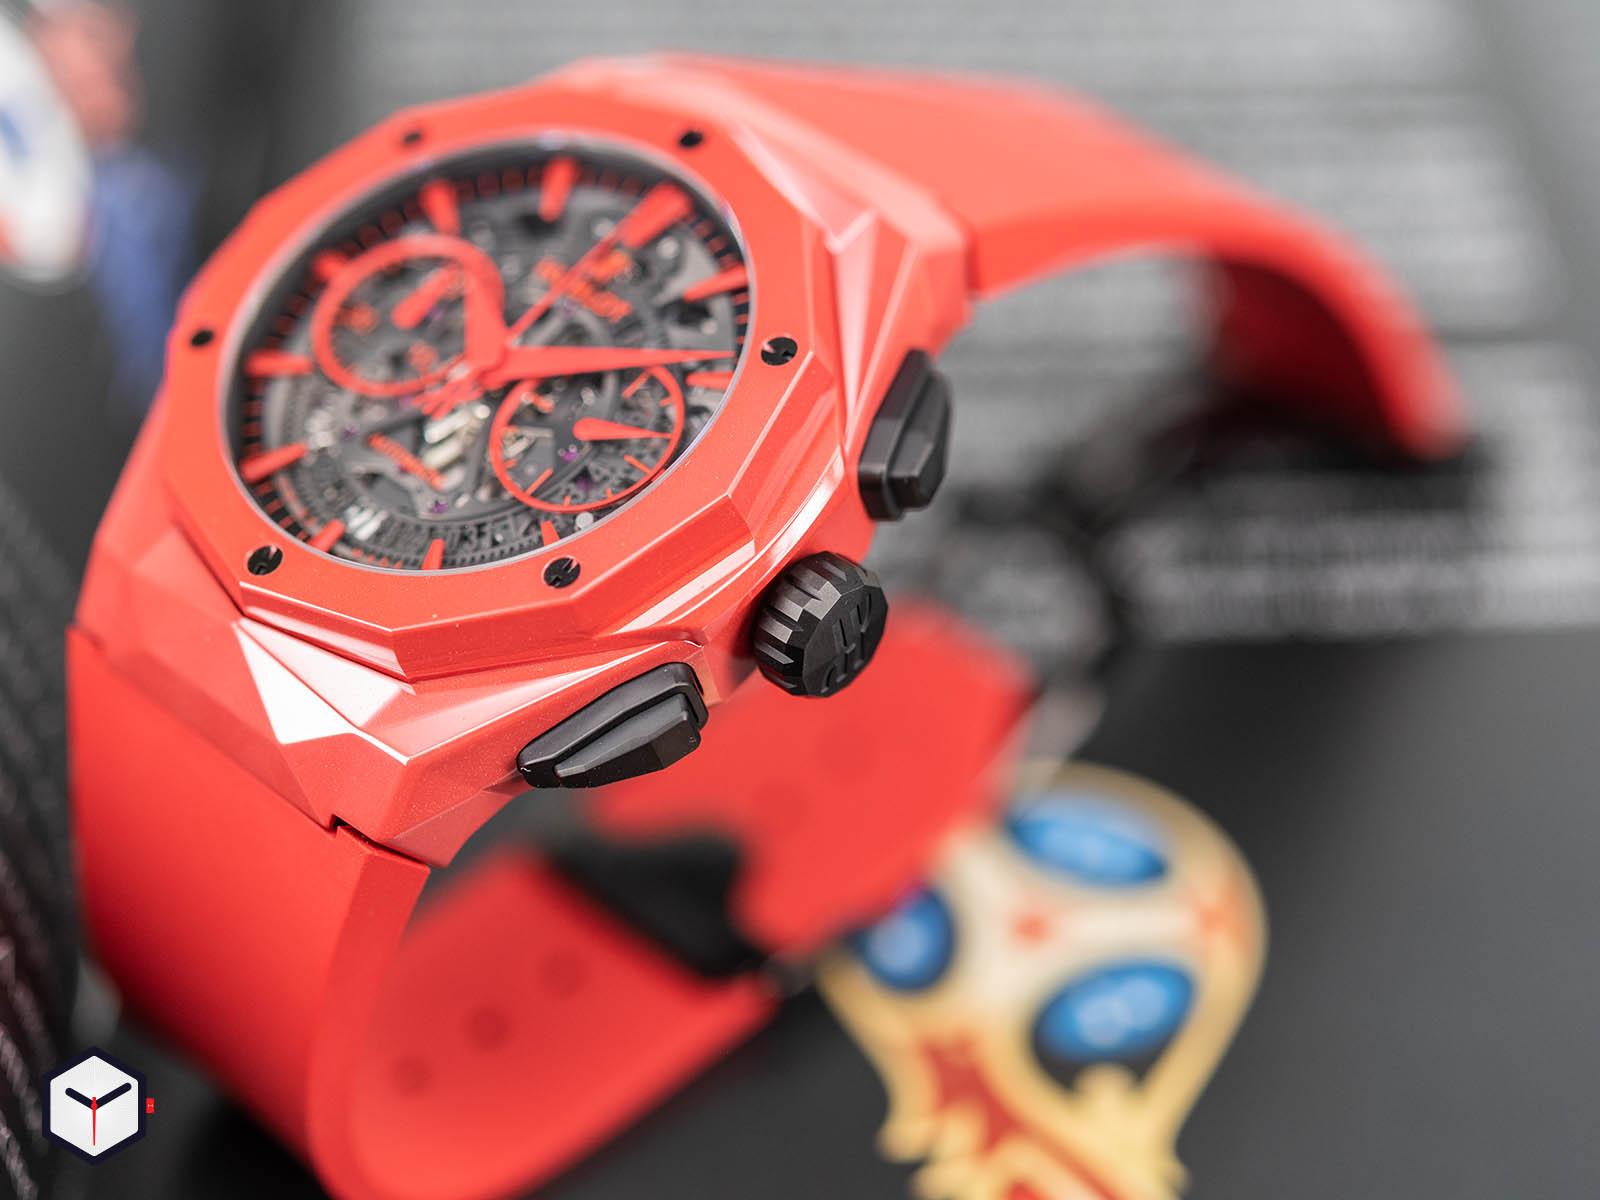 525-cf-0130-rx-orl19-hublot-classic-fusion-chronograph-orlinski-red-ceramic-4.jpg